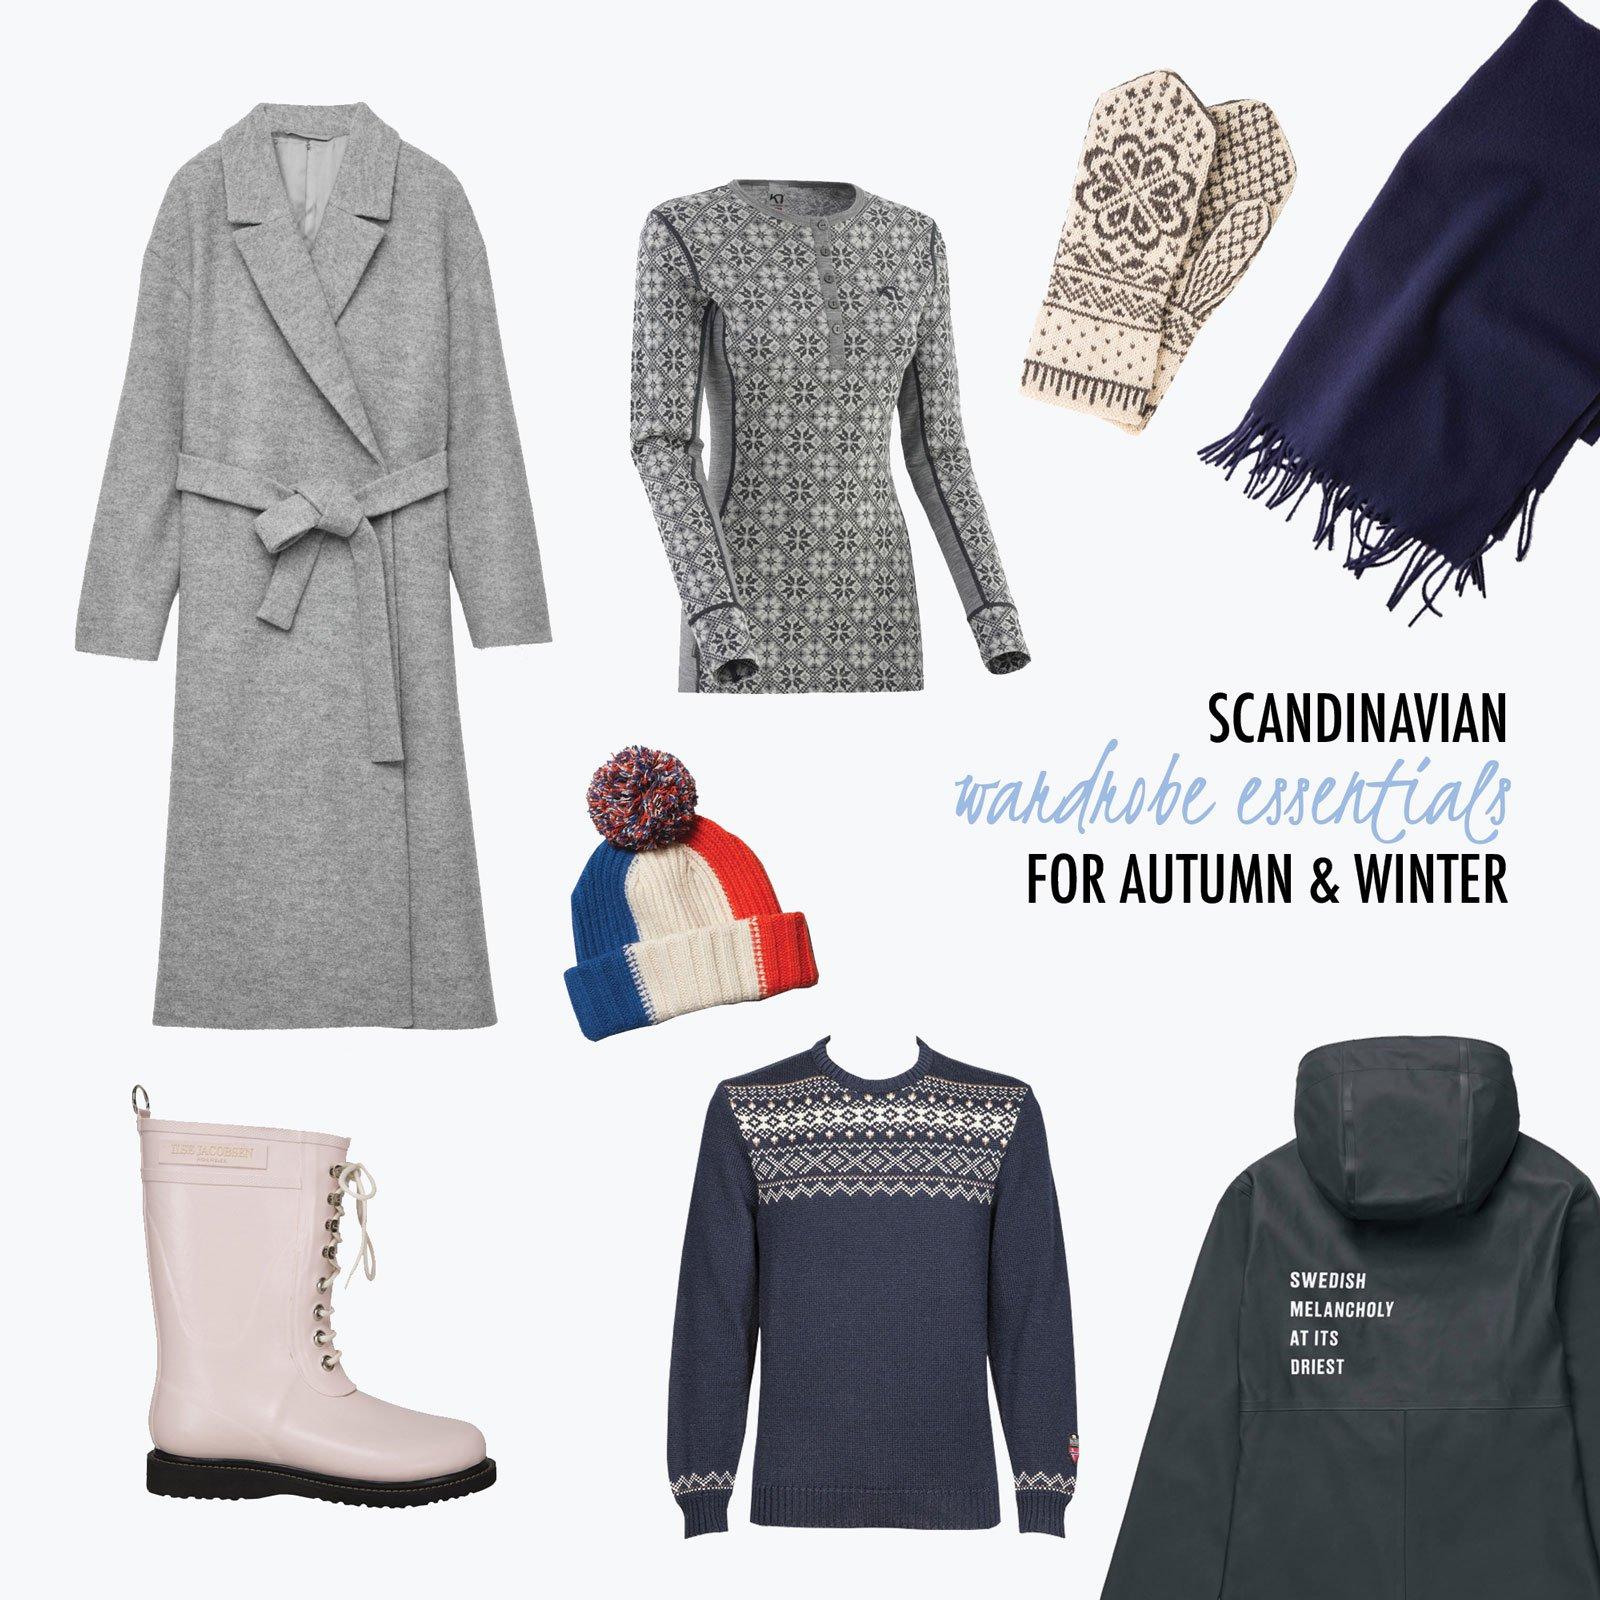 typical scandinavian outfit autumn winter essentials